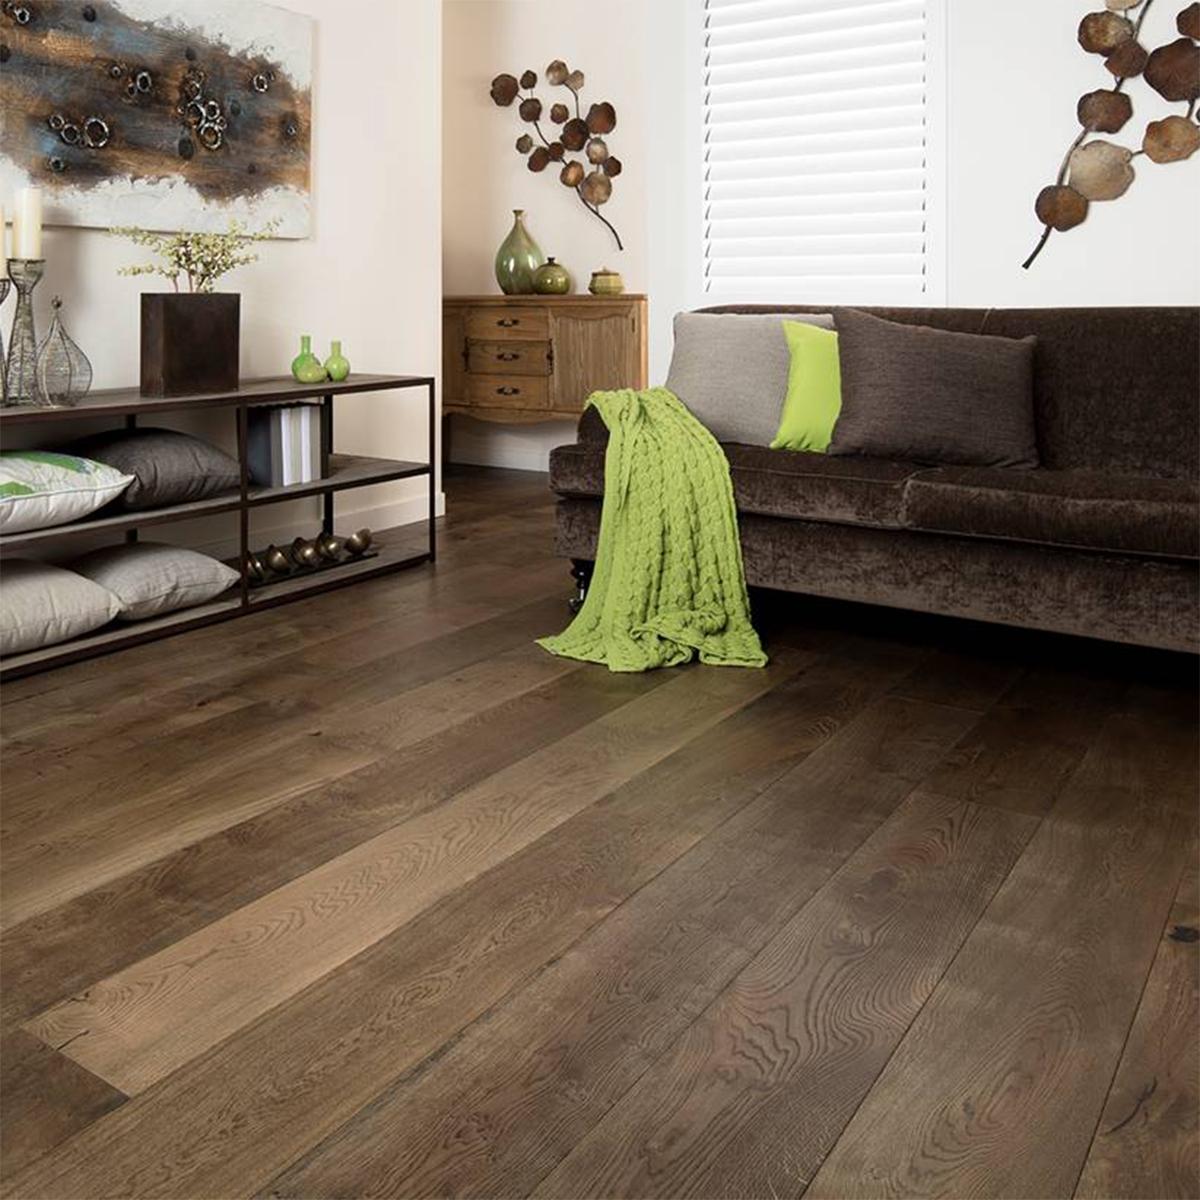 KIMI French Grey Oak - European Oak Engineered Floorboards - Extra-Wide 2200mm x 220mm x 20mm